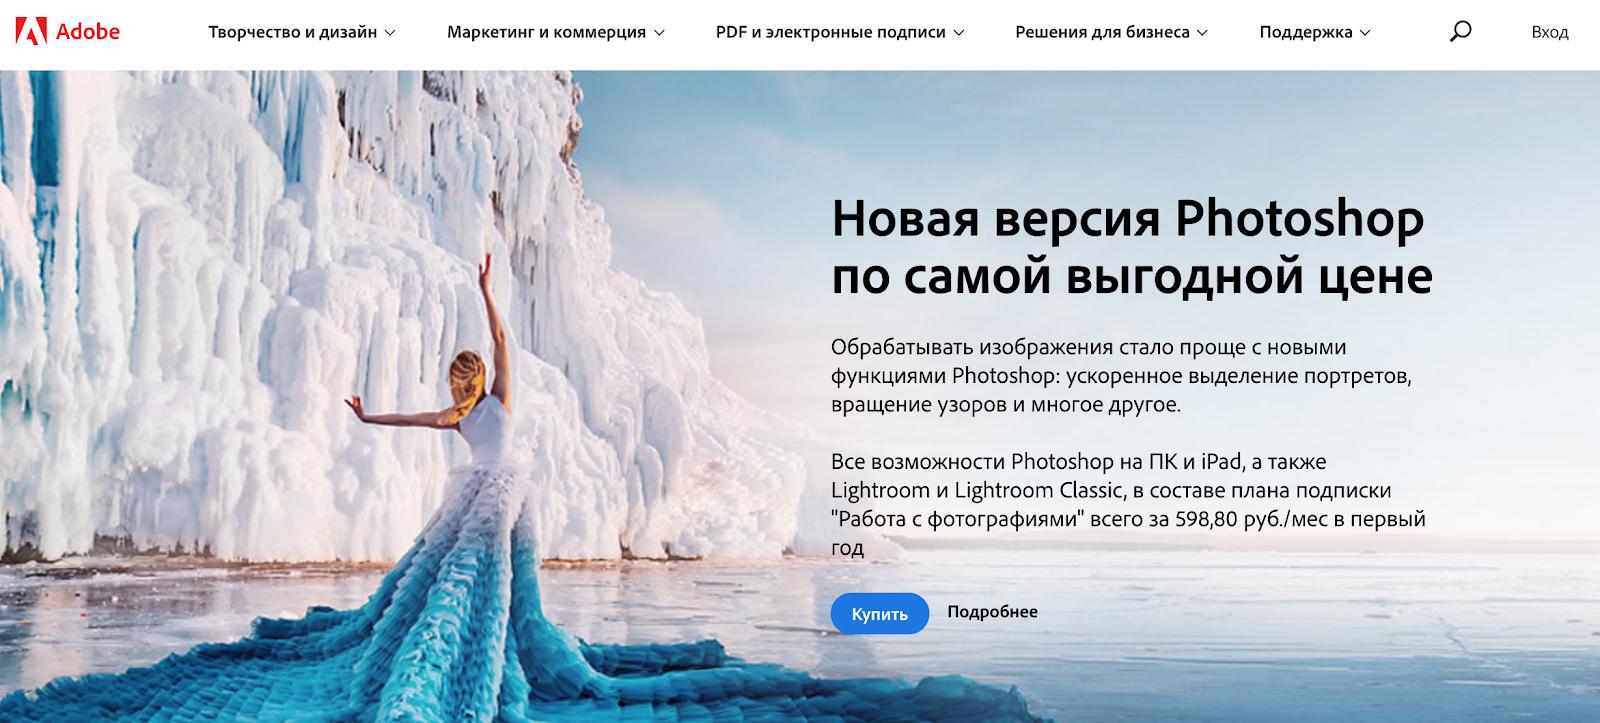 Russian version of Adobe website